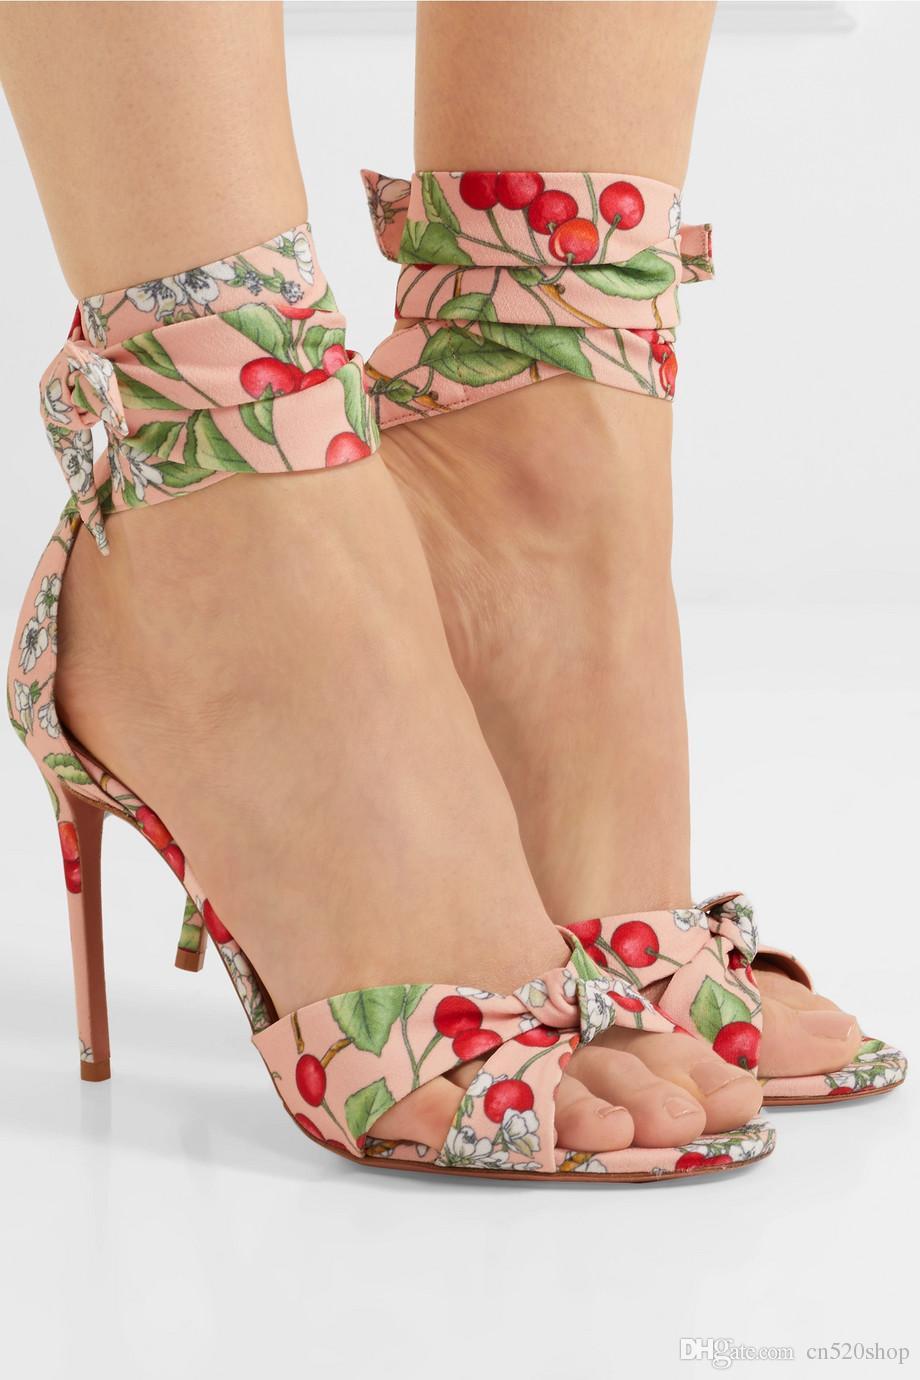 Donna High Heels Party Sandalos Princess Style Flower Summer Evening Party Heels ... 1aeb3e